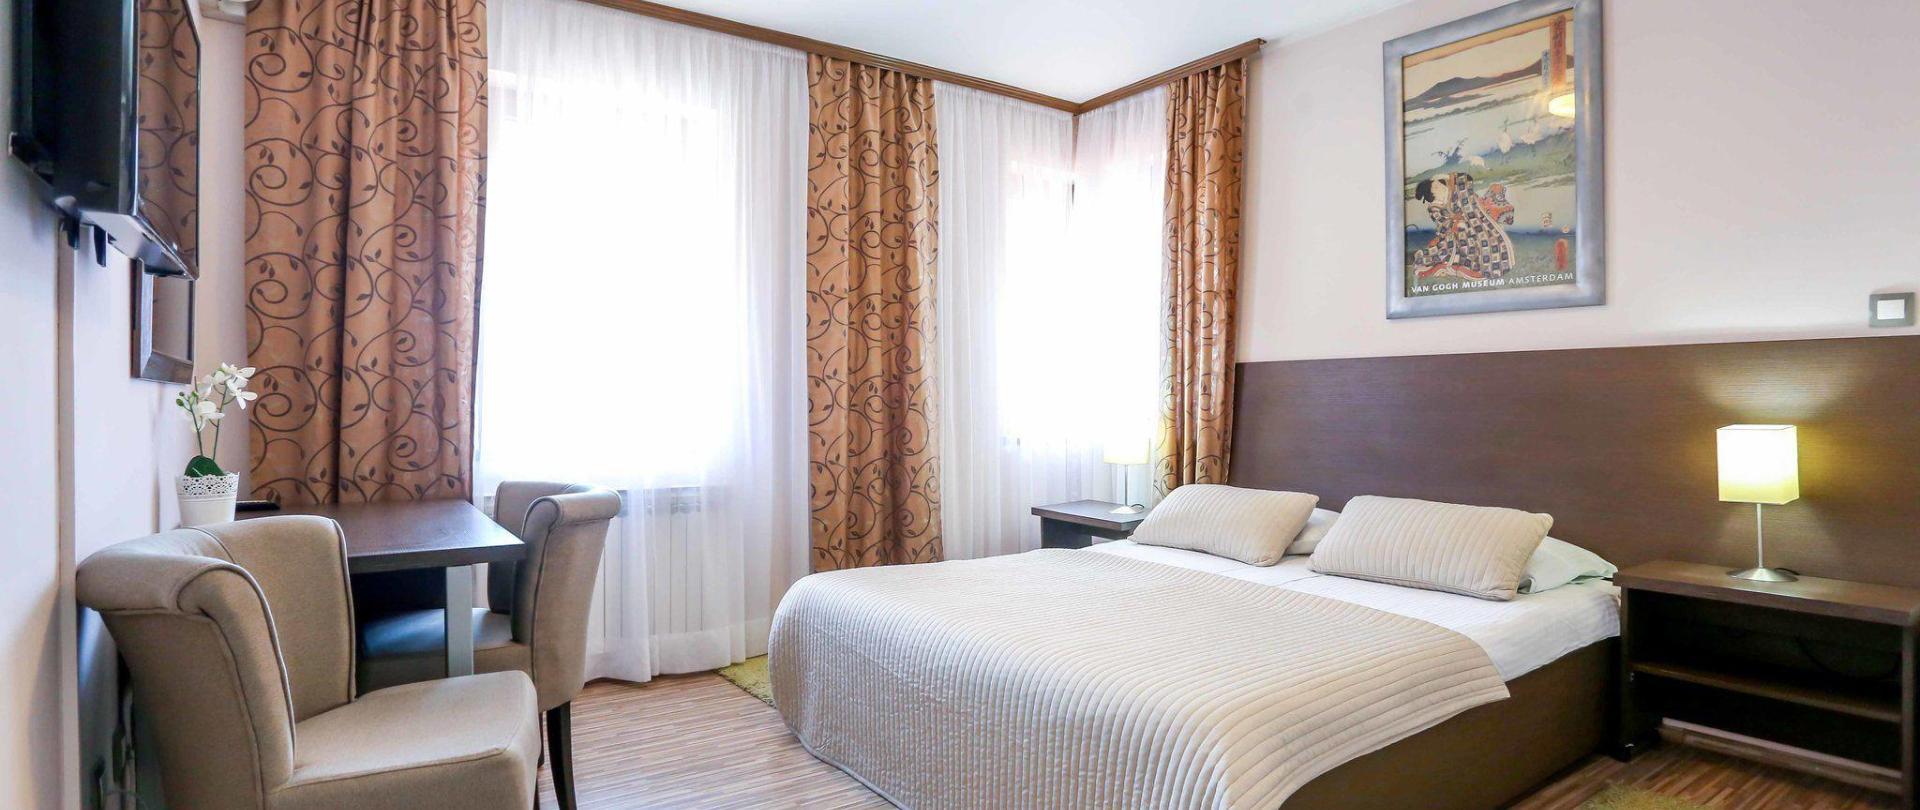 hotel-divan-by-dzenat-drekovic-29-08-2016-13.jpg